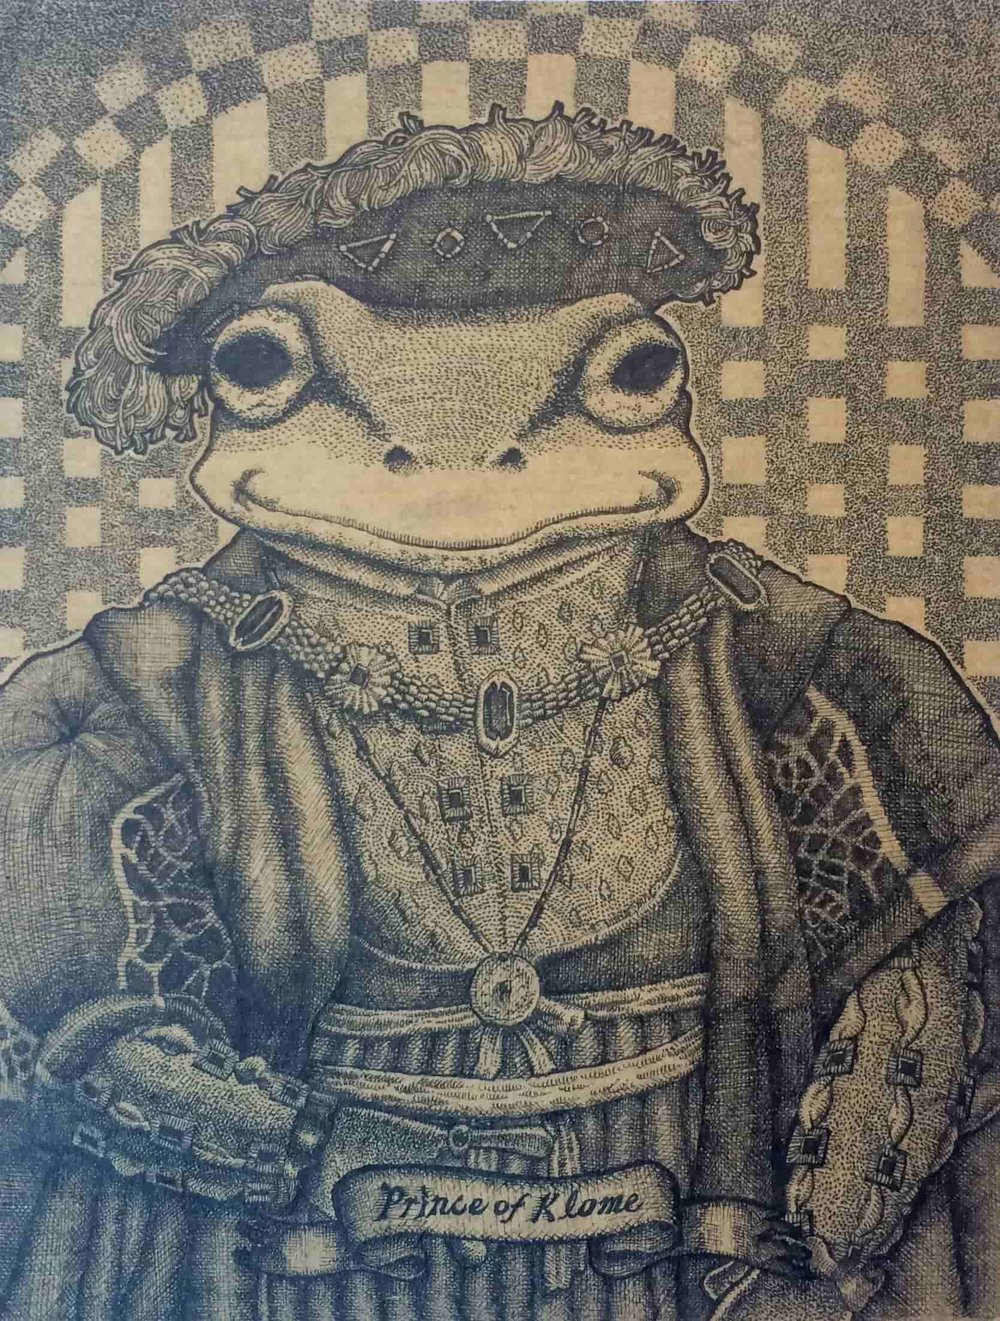 Prince of Klome-min.jpg